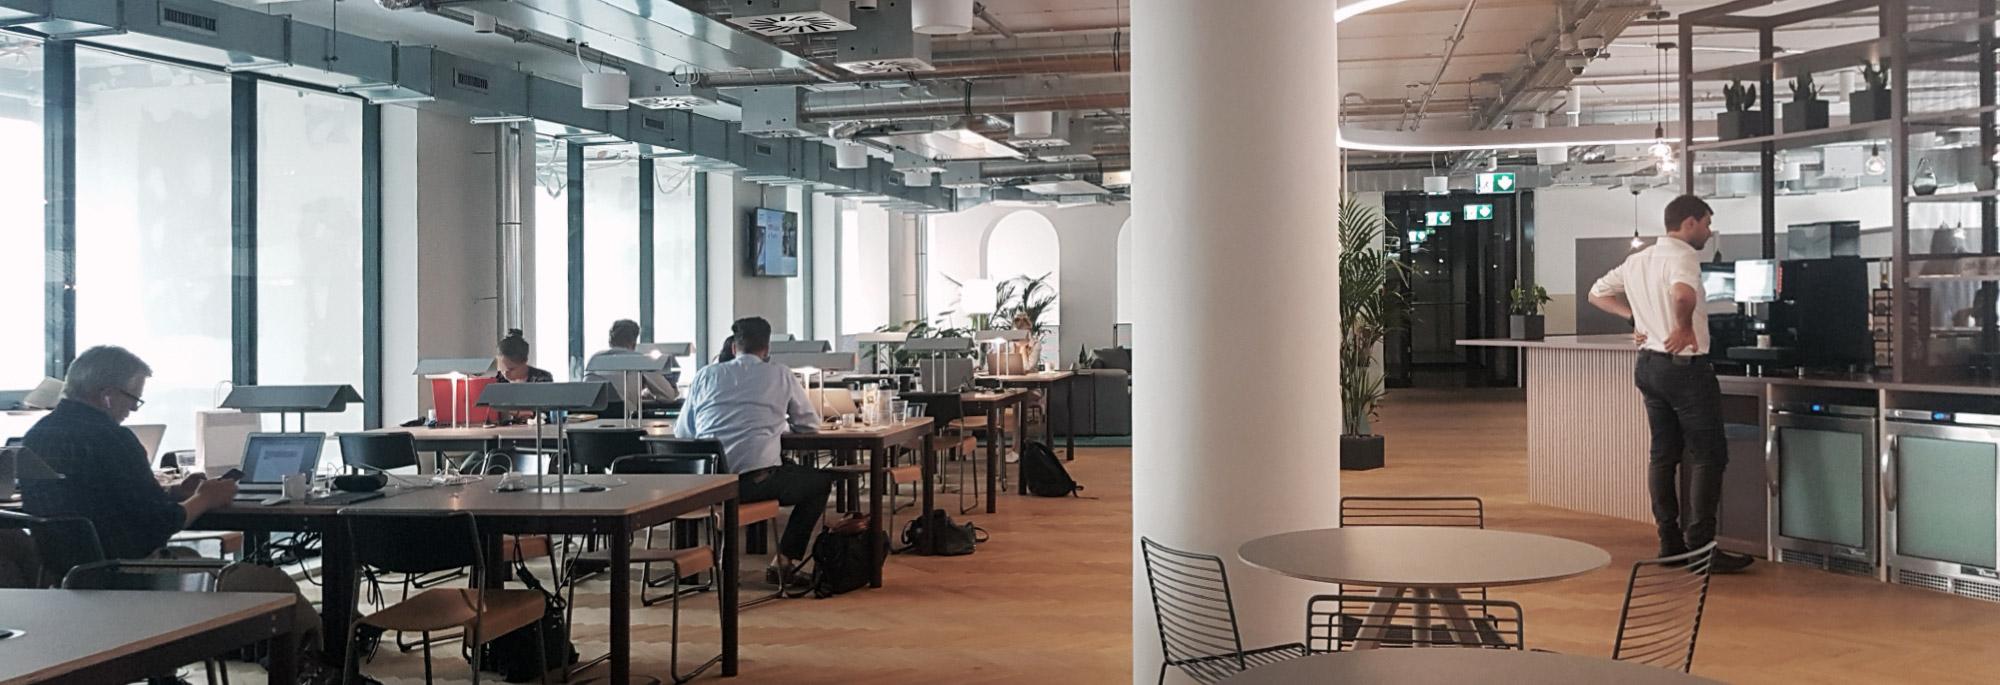 Coworking Definition - Was ist Coworking? - Co-Working in Frankfurt am Main - Flexible Büroflächen